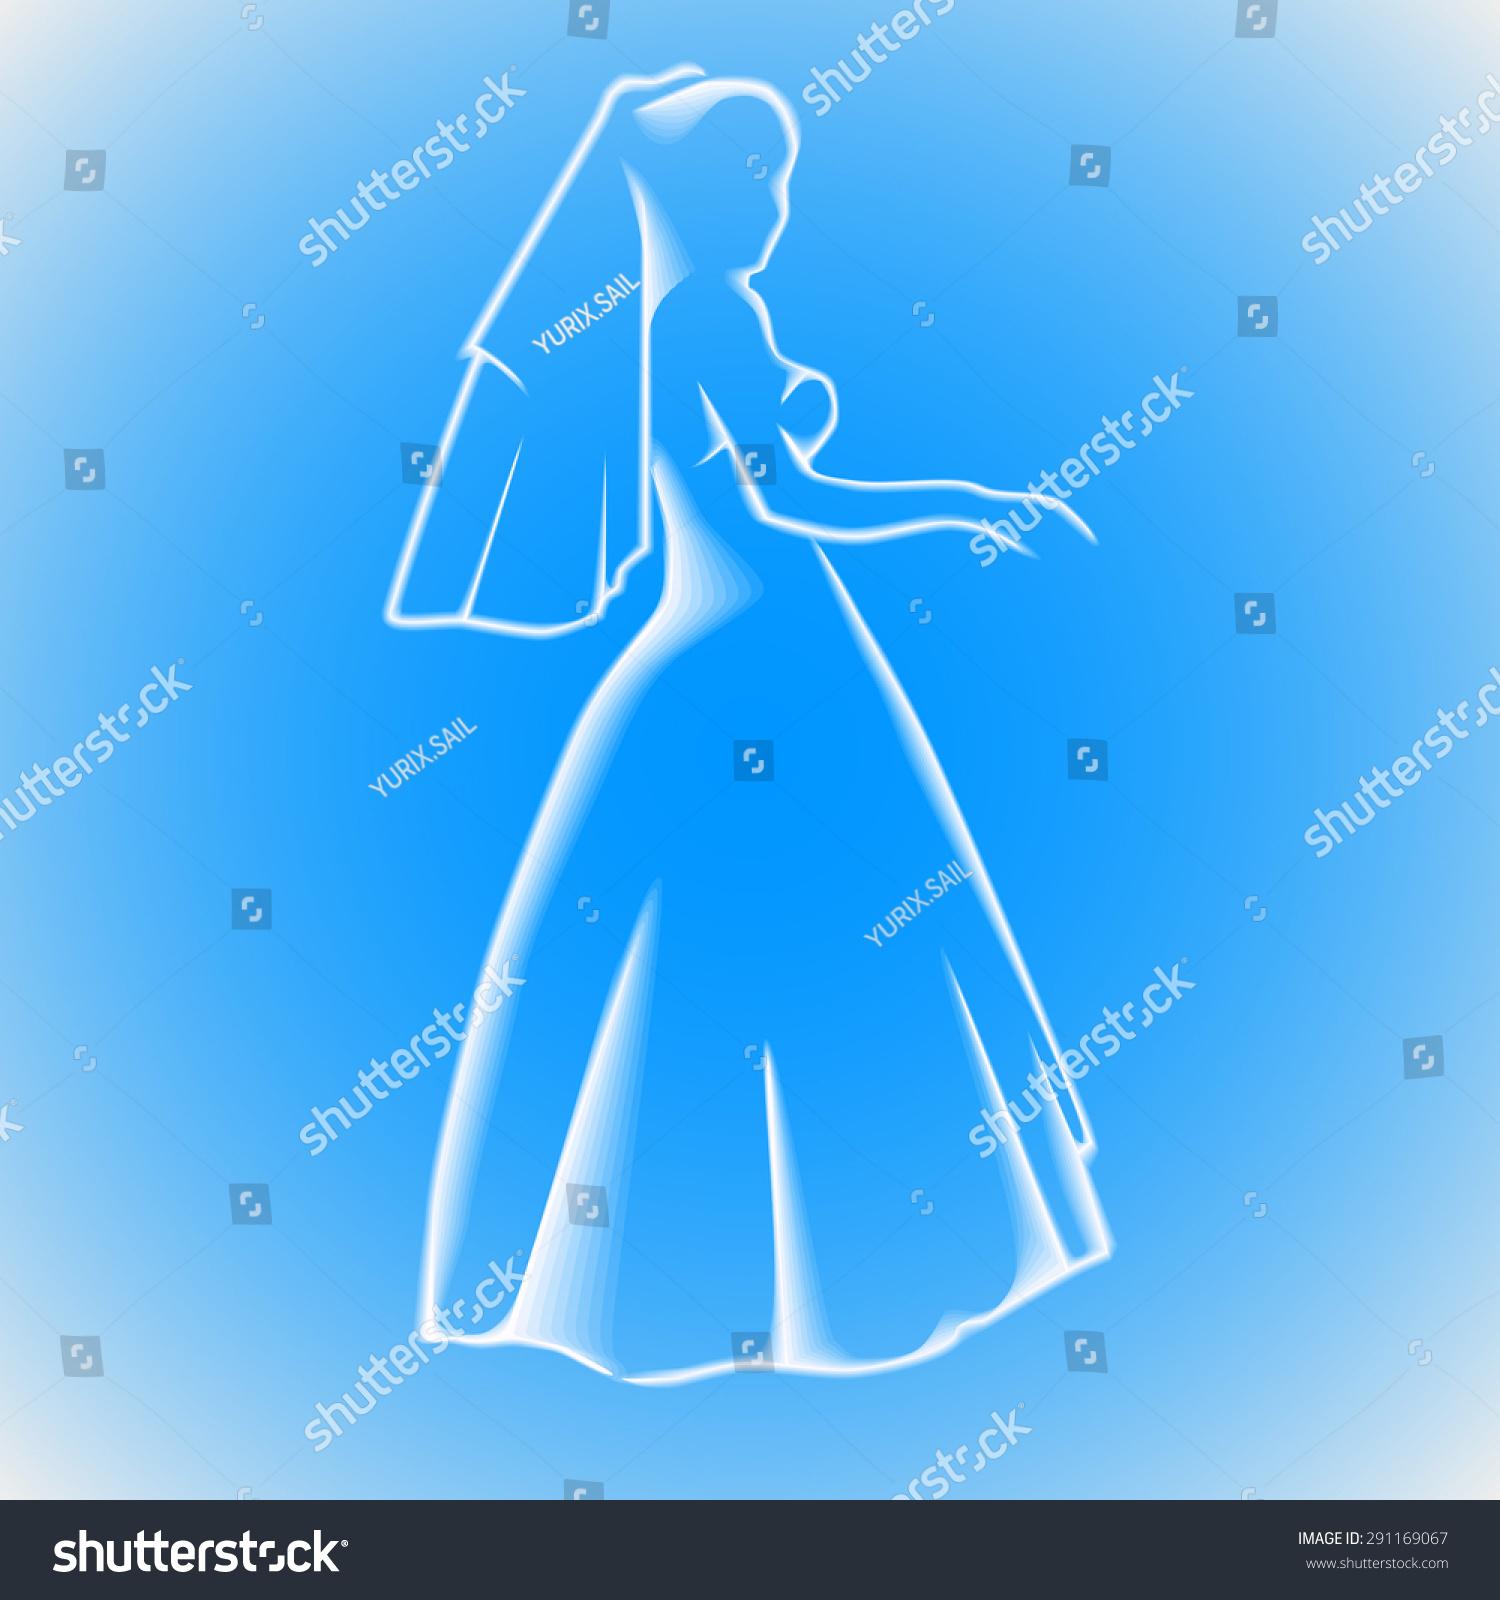 Sketch Silhouette Bride Her Wedding Dress Stock Photo (Photo, Vector ...